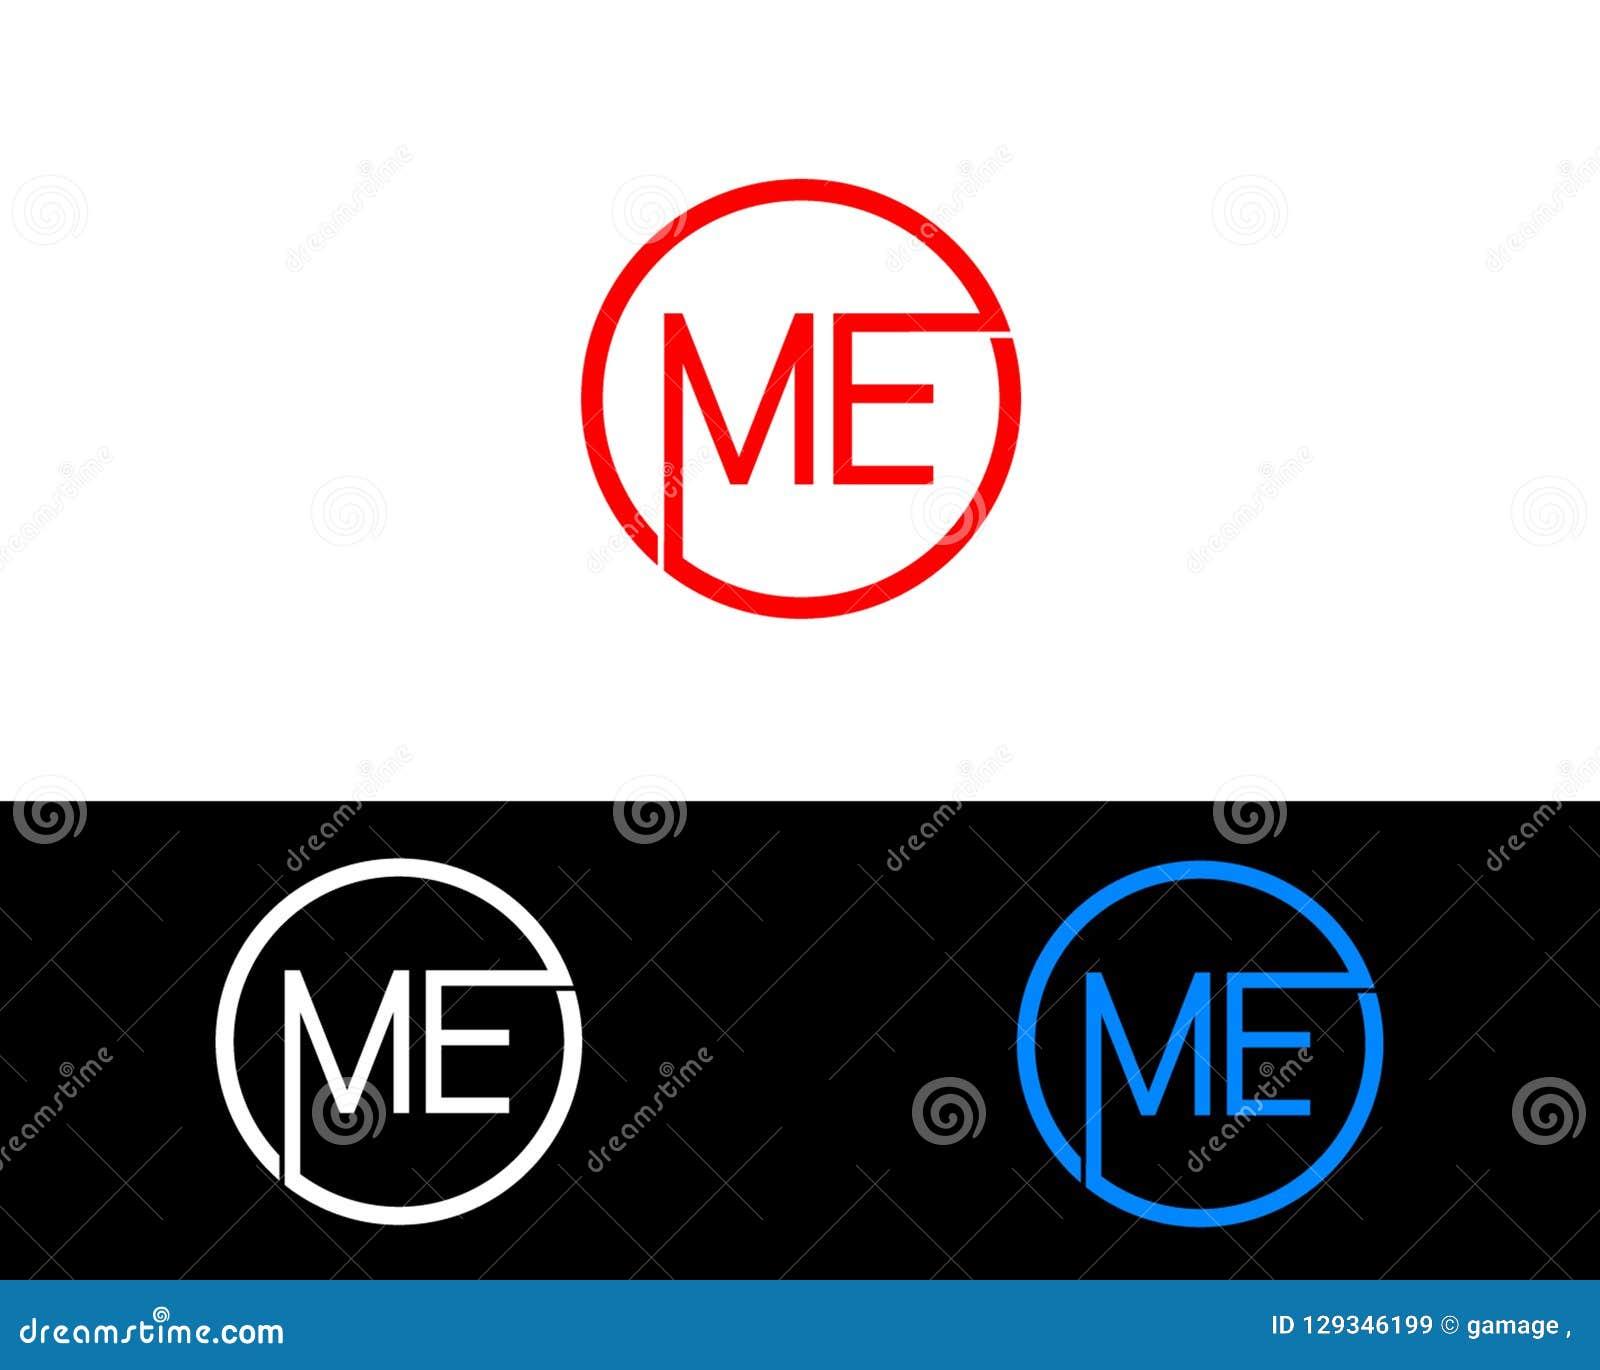 me circle shape letter logo design stock vector illustration of